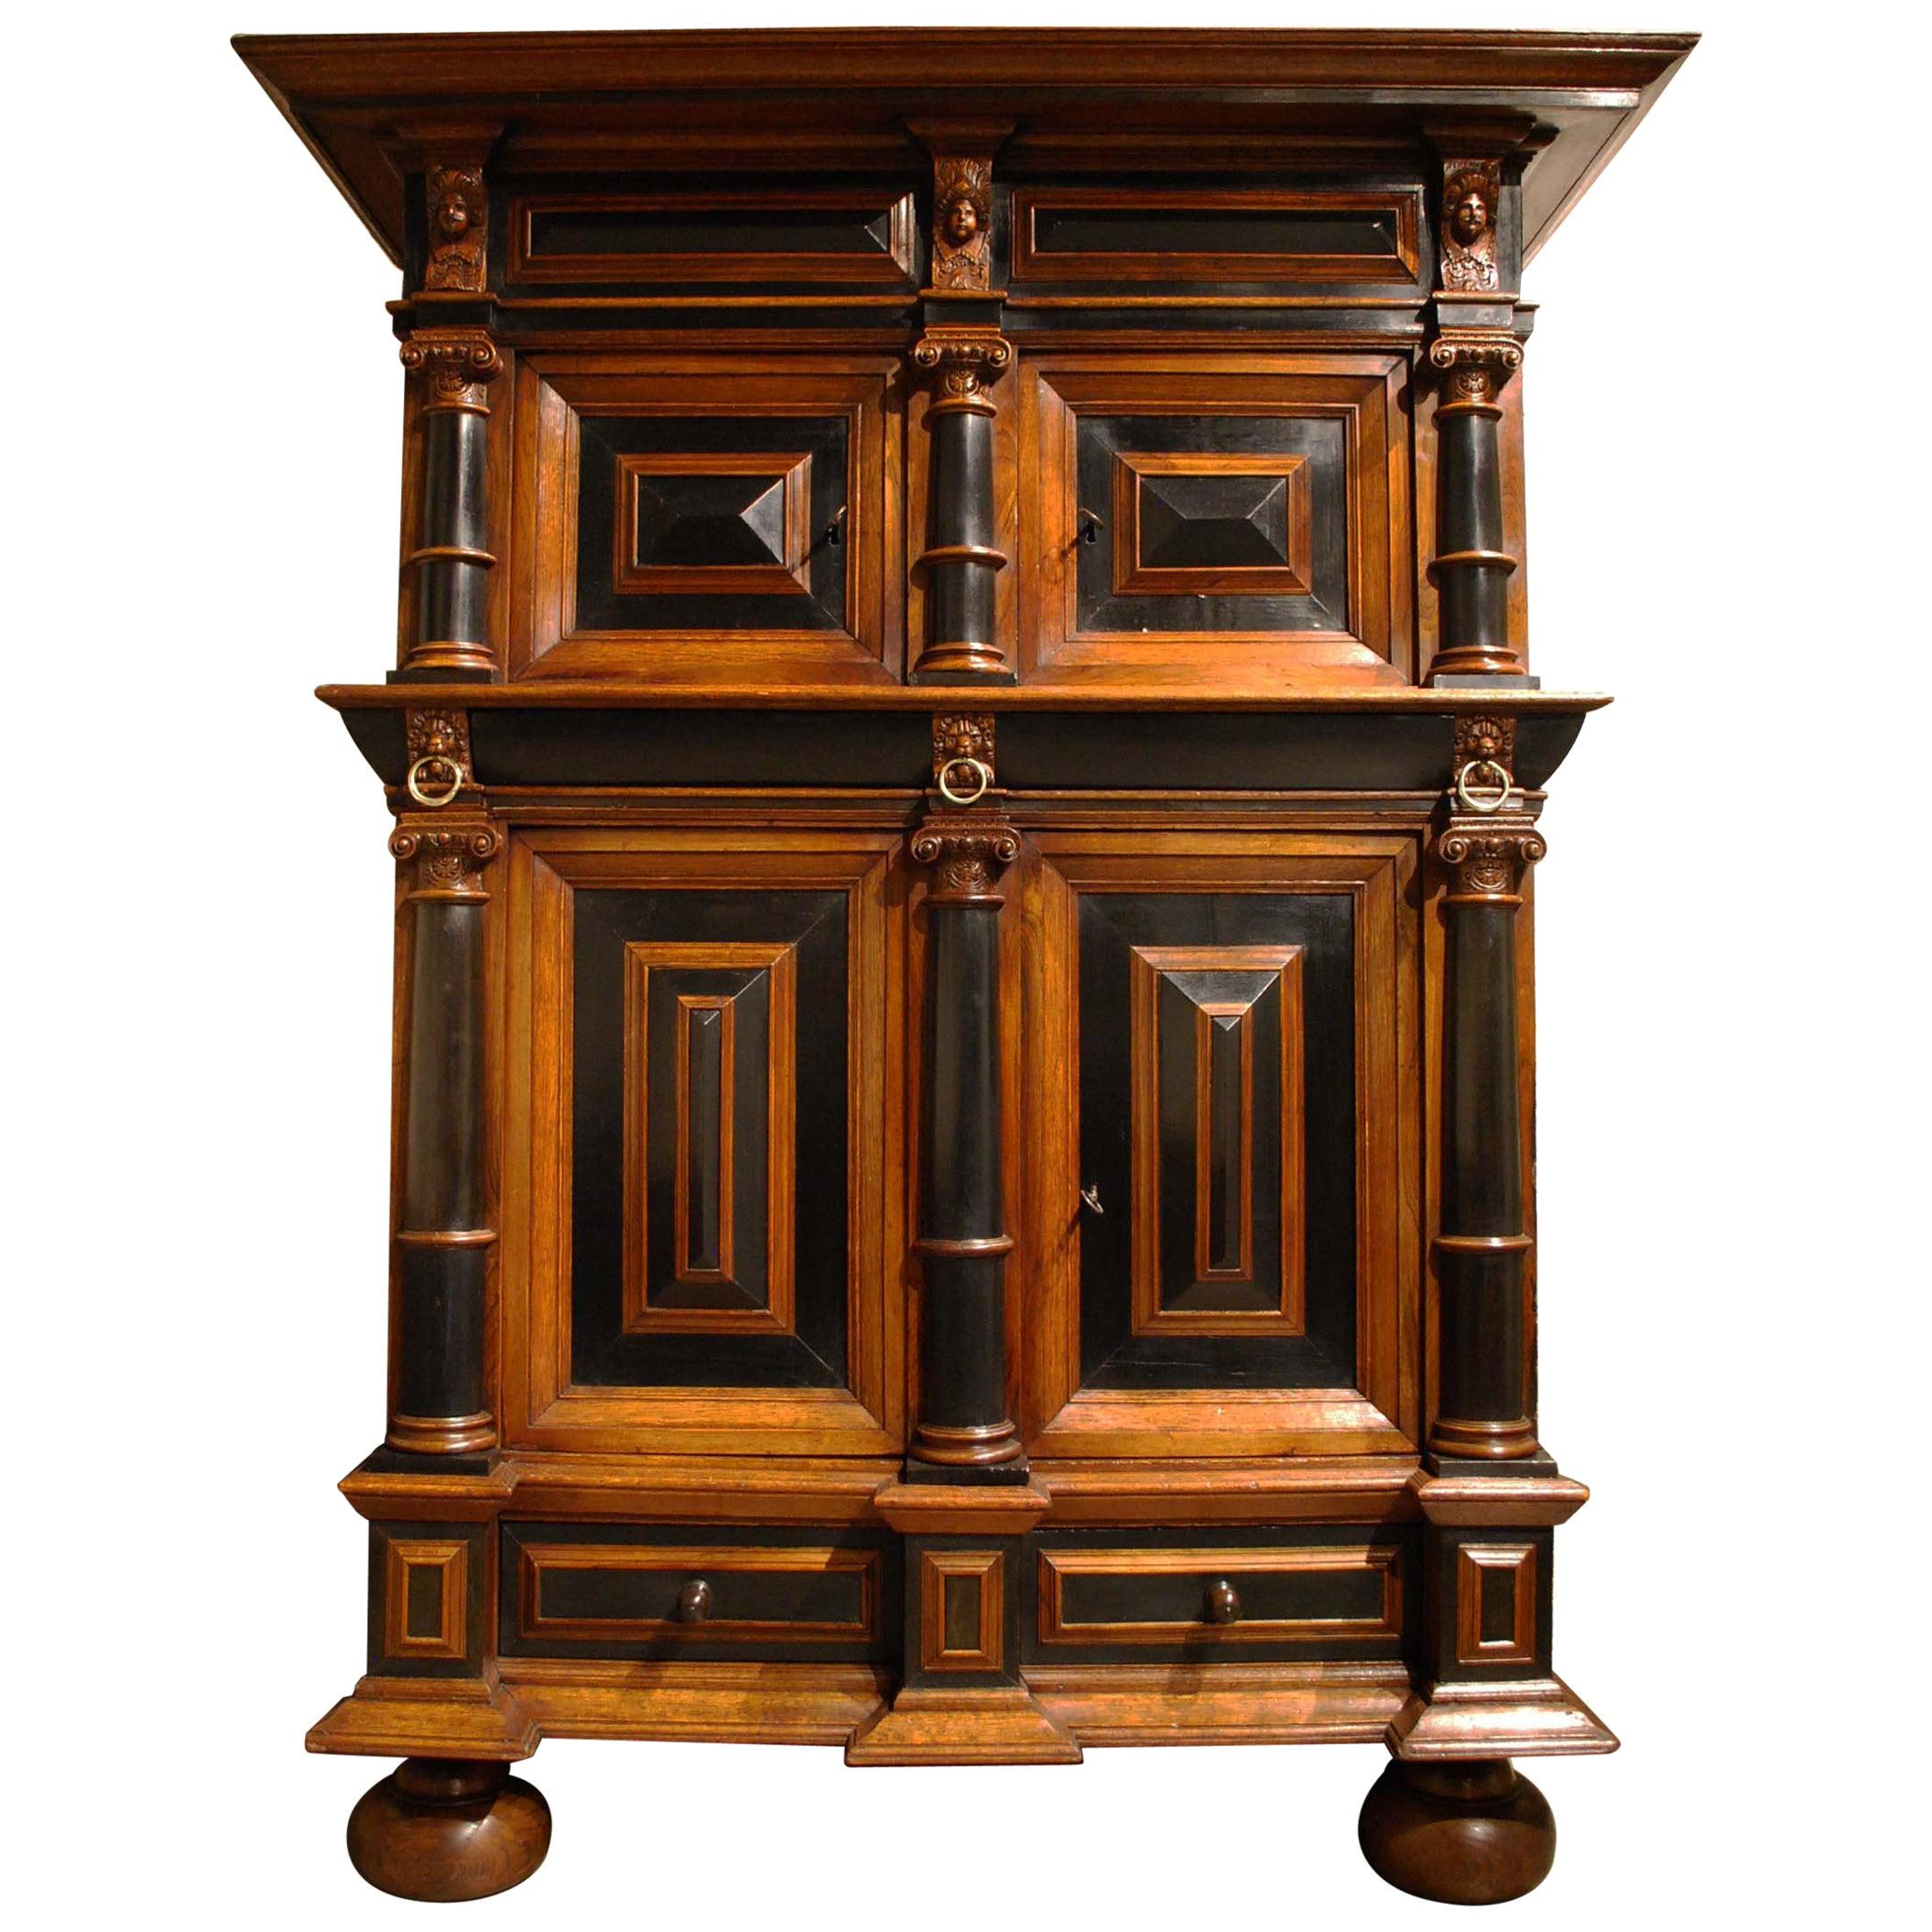 Antique 17th Century Oak Dutch Baroque Cushion Cabinet with Ebony and Mahogany